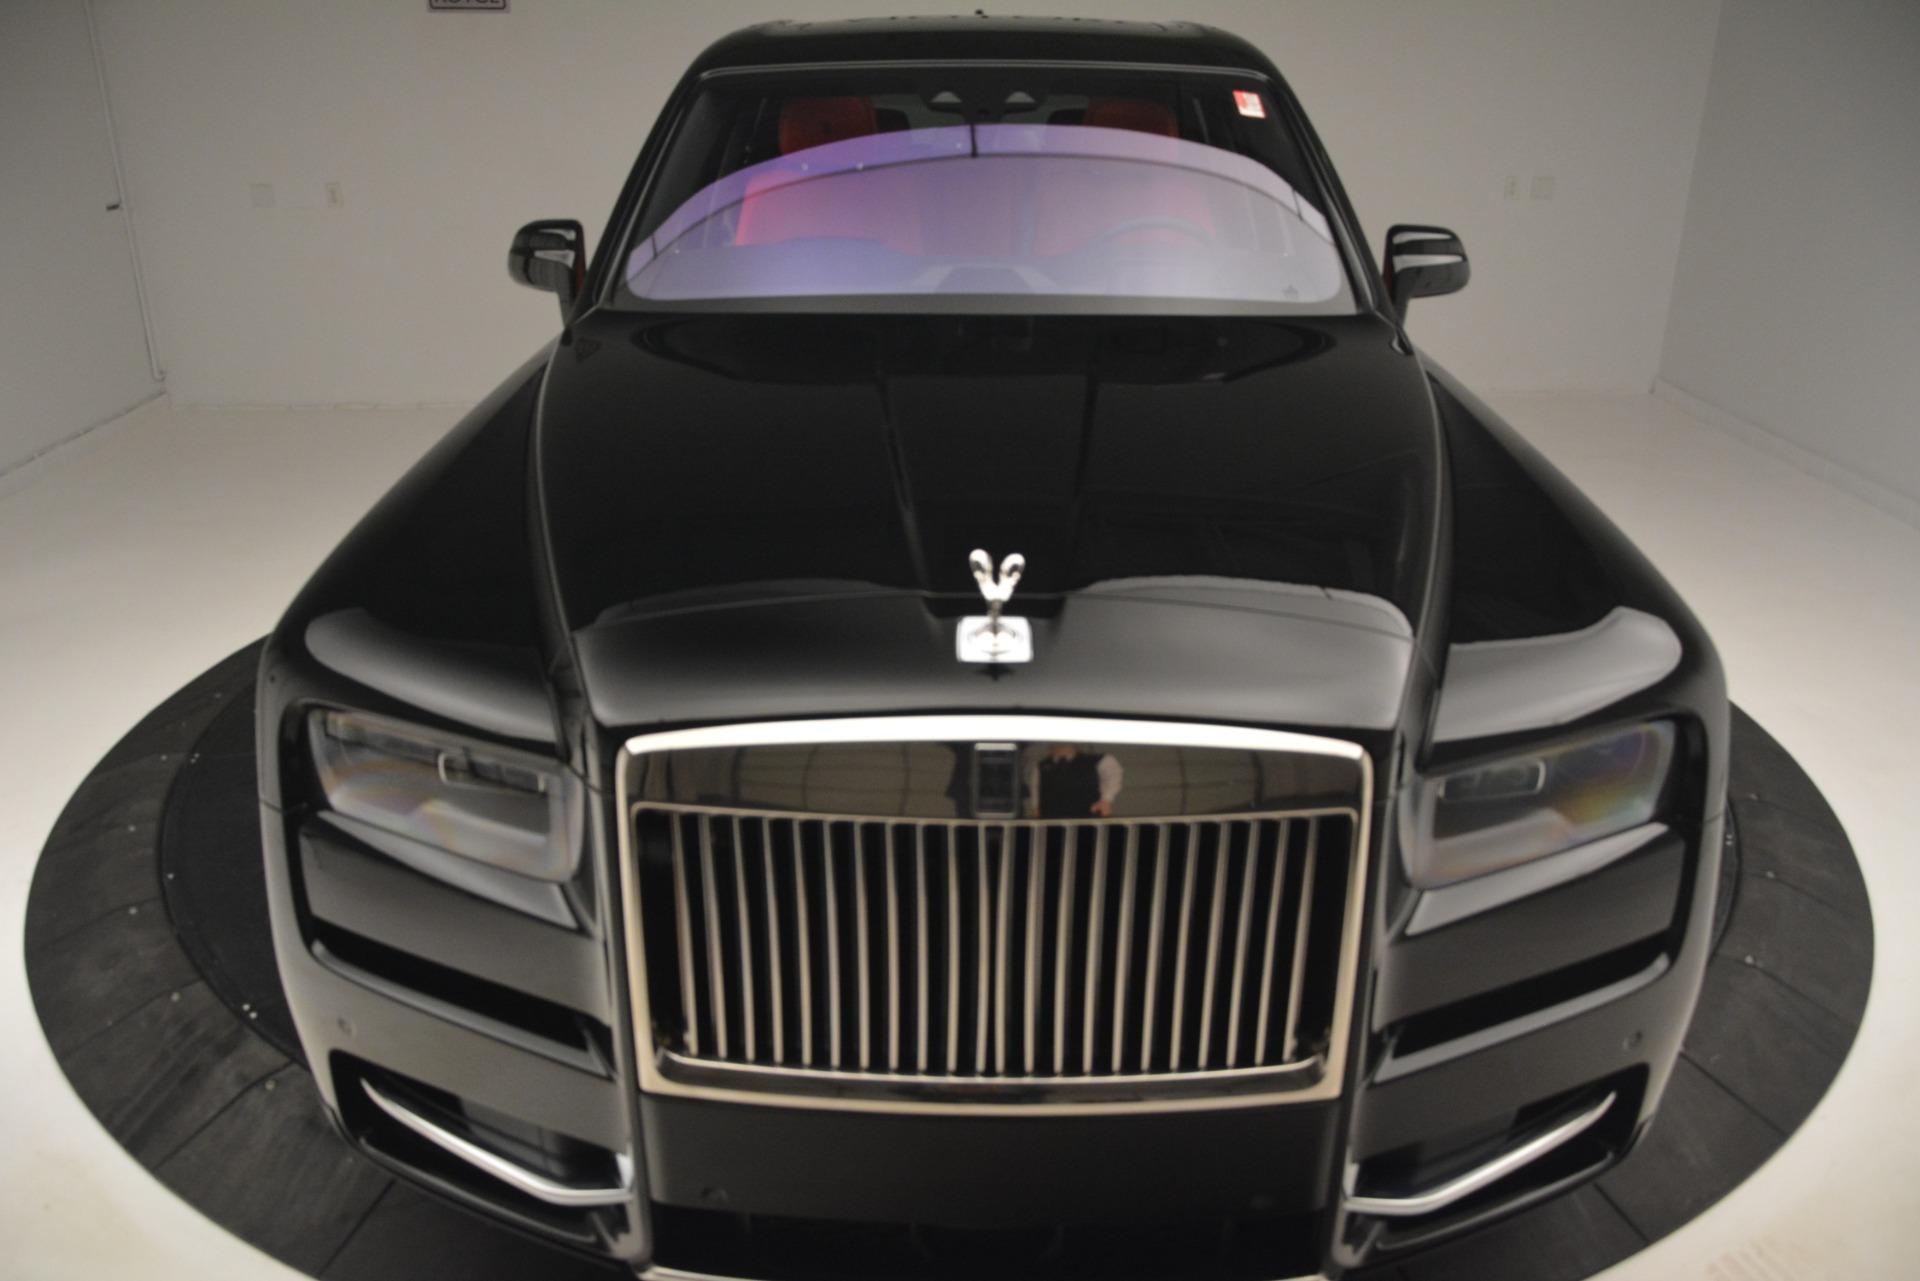 New 2019 Rolls-Royce Cullinan  For Sale In Greenwich, CT 2852_p15